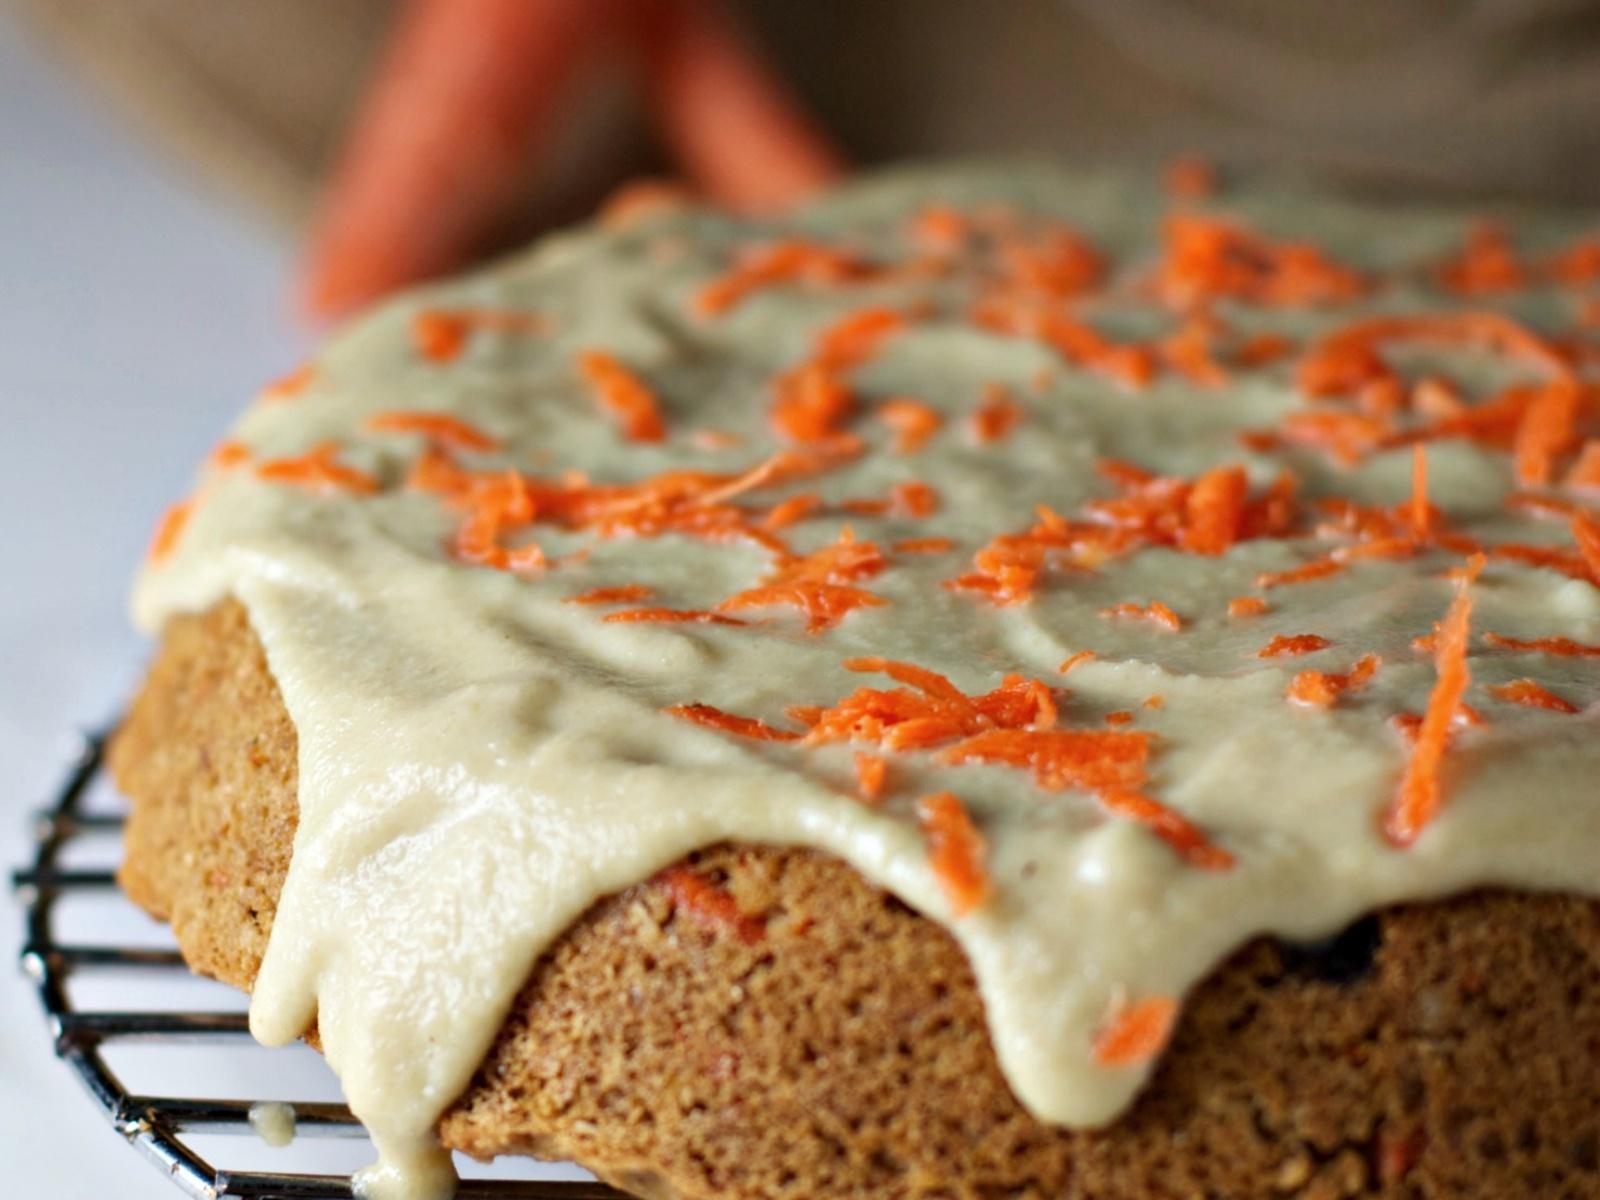 Vegan Orange Scented Carrot Cake With Cashew Cream Frosting